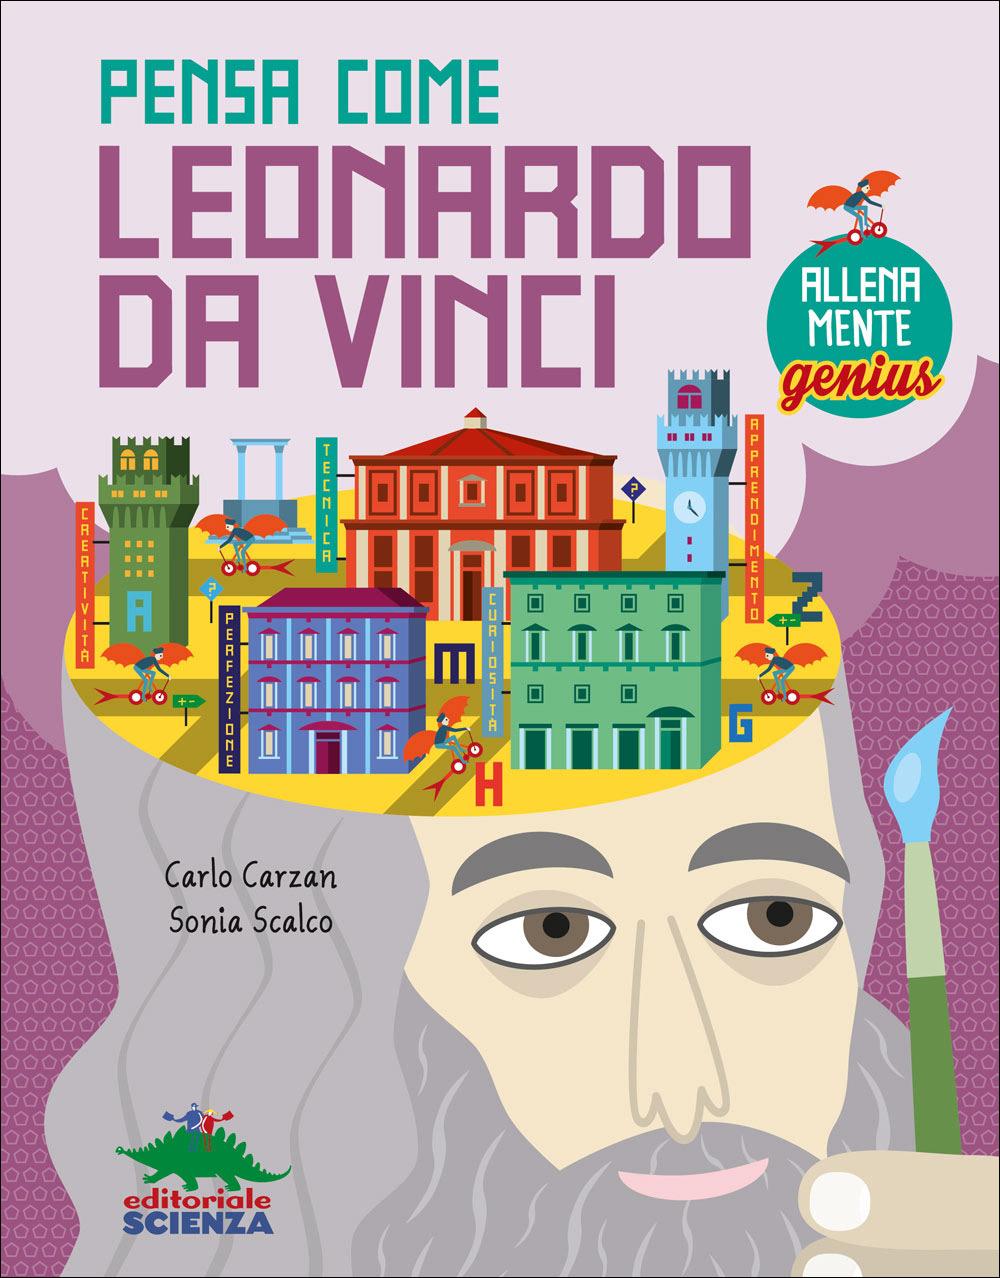 Allenamente Genius - Pensa come Leonardo da Vinci